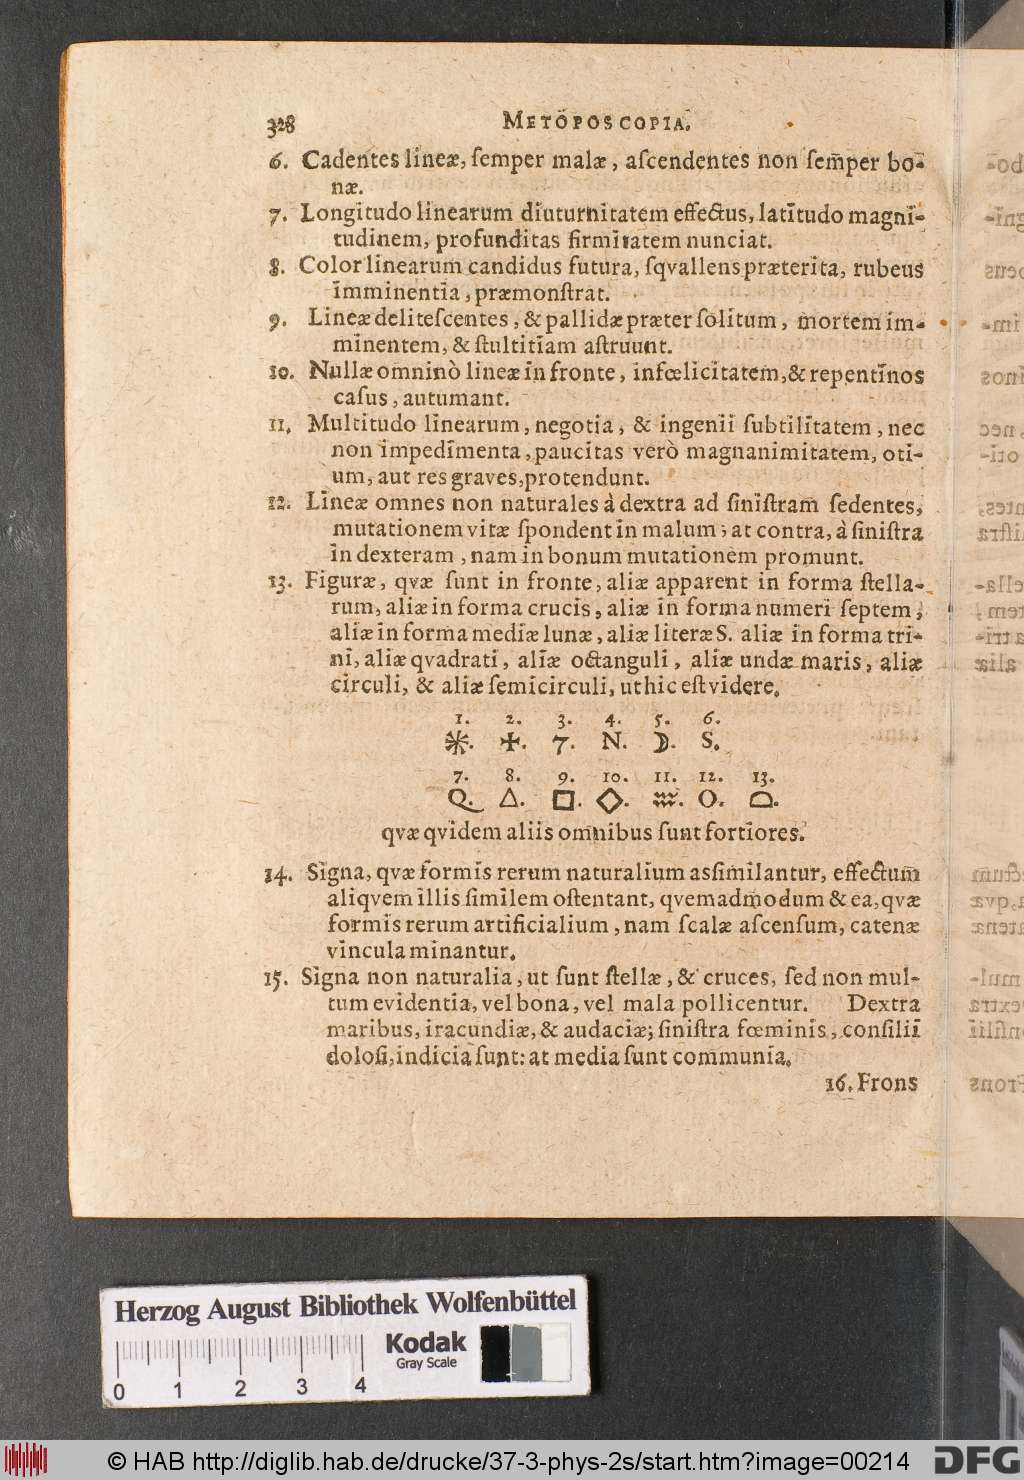 http://diglib.hab.de/drucke/37-3-phys-2s/00214.jpg